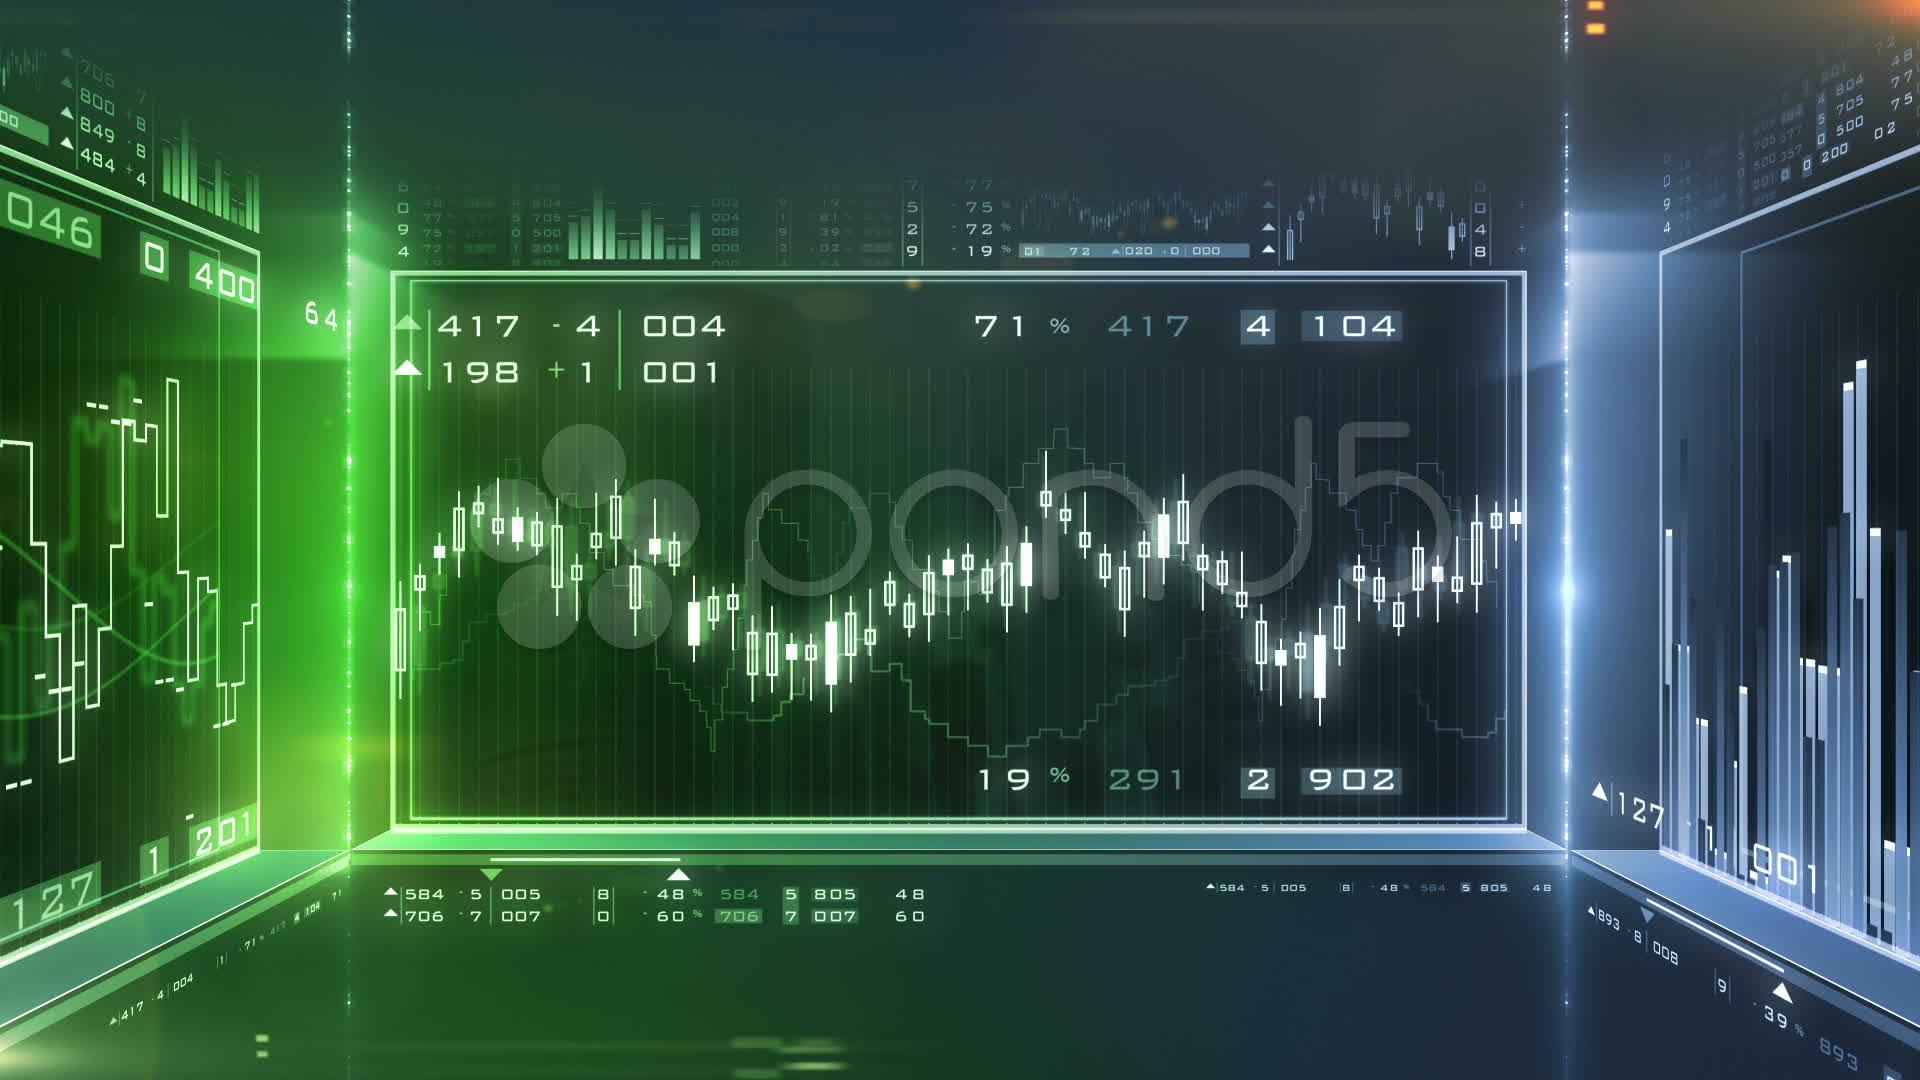 Oscillators and Momentum Indicators